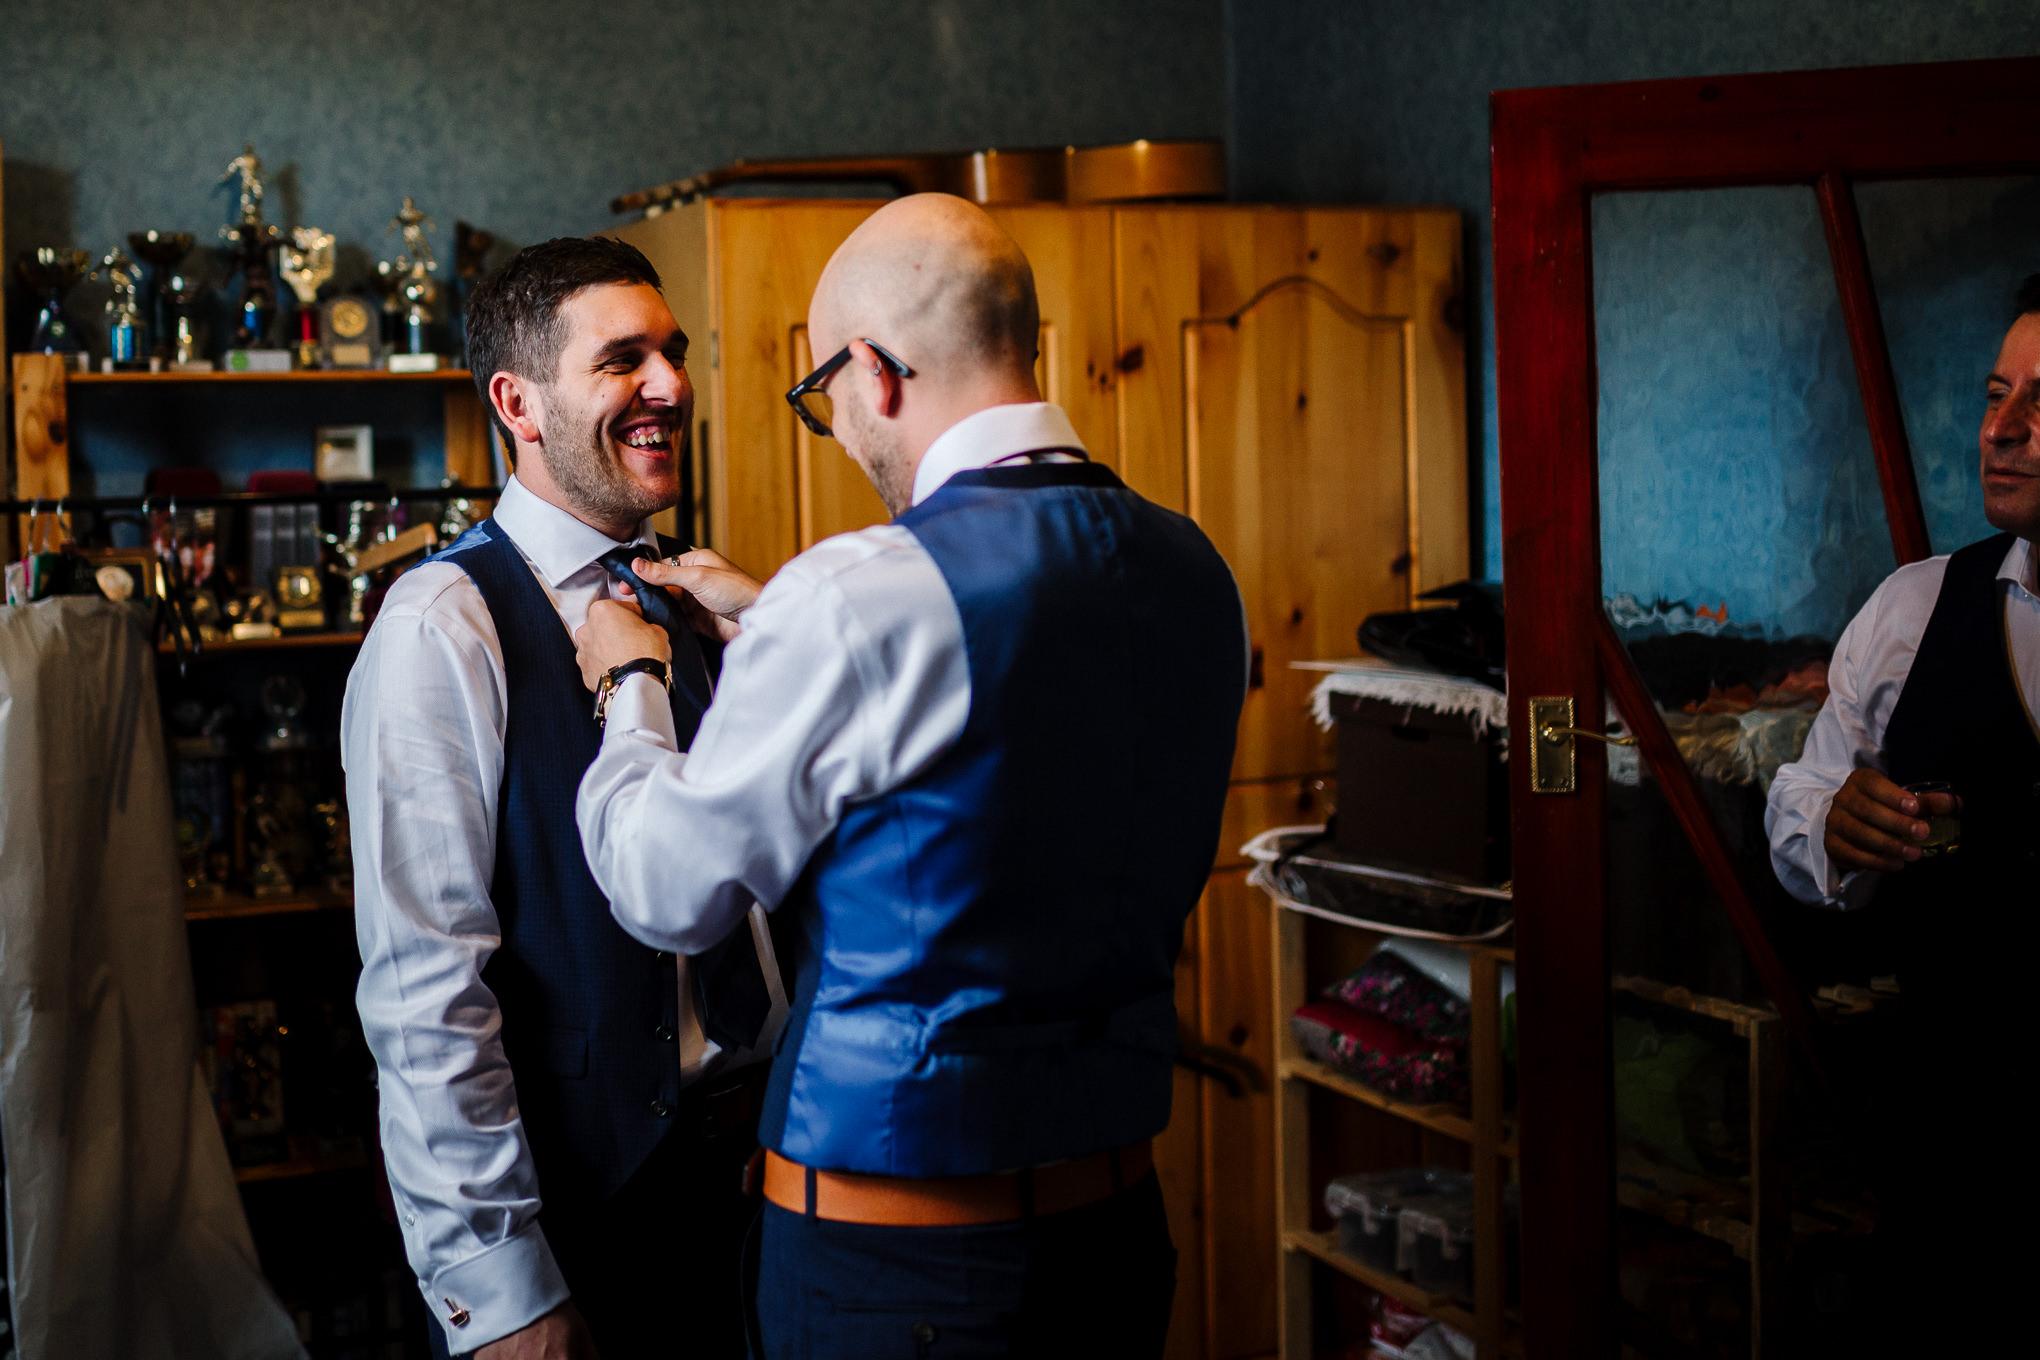 Best man tying the grooms tie.